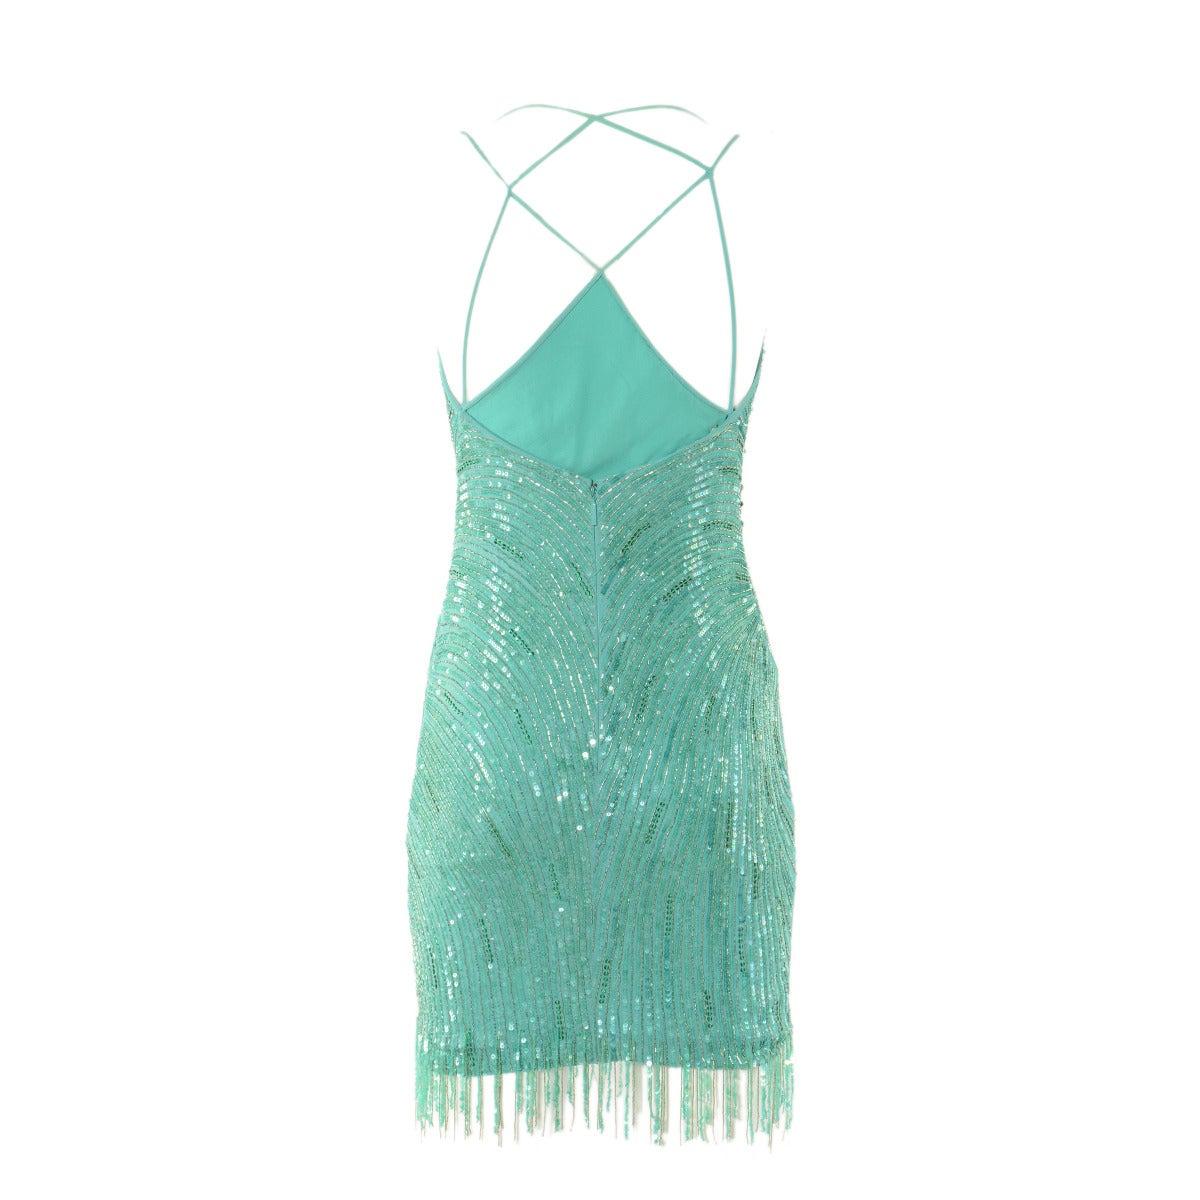 Roberto Cavalli Aqua Green Embroidered Silk Cocktail Dress 2